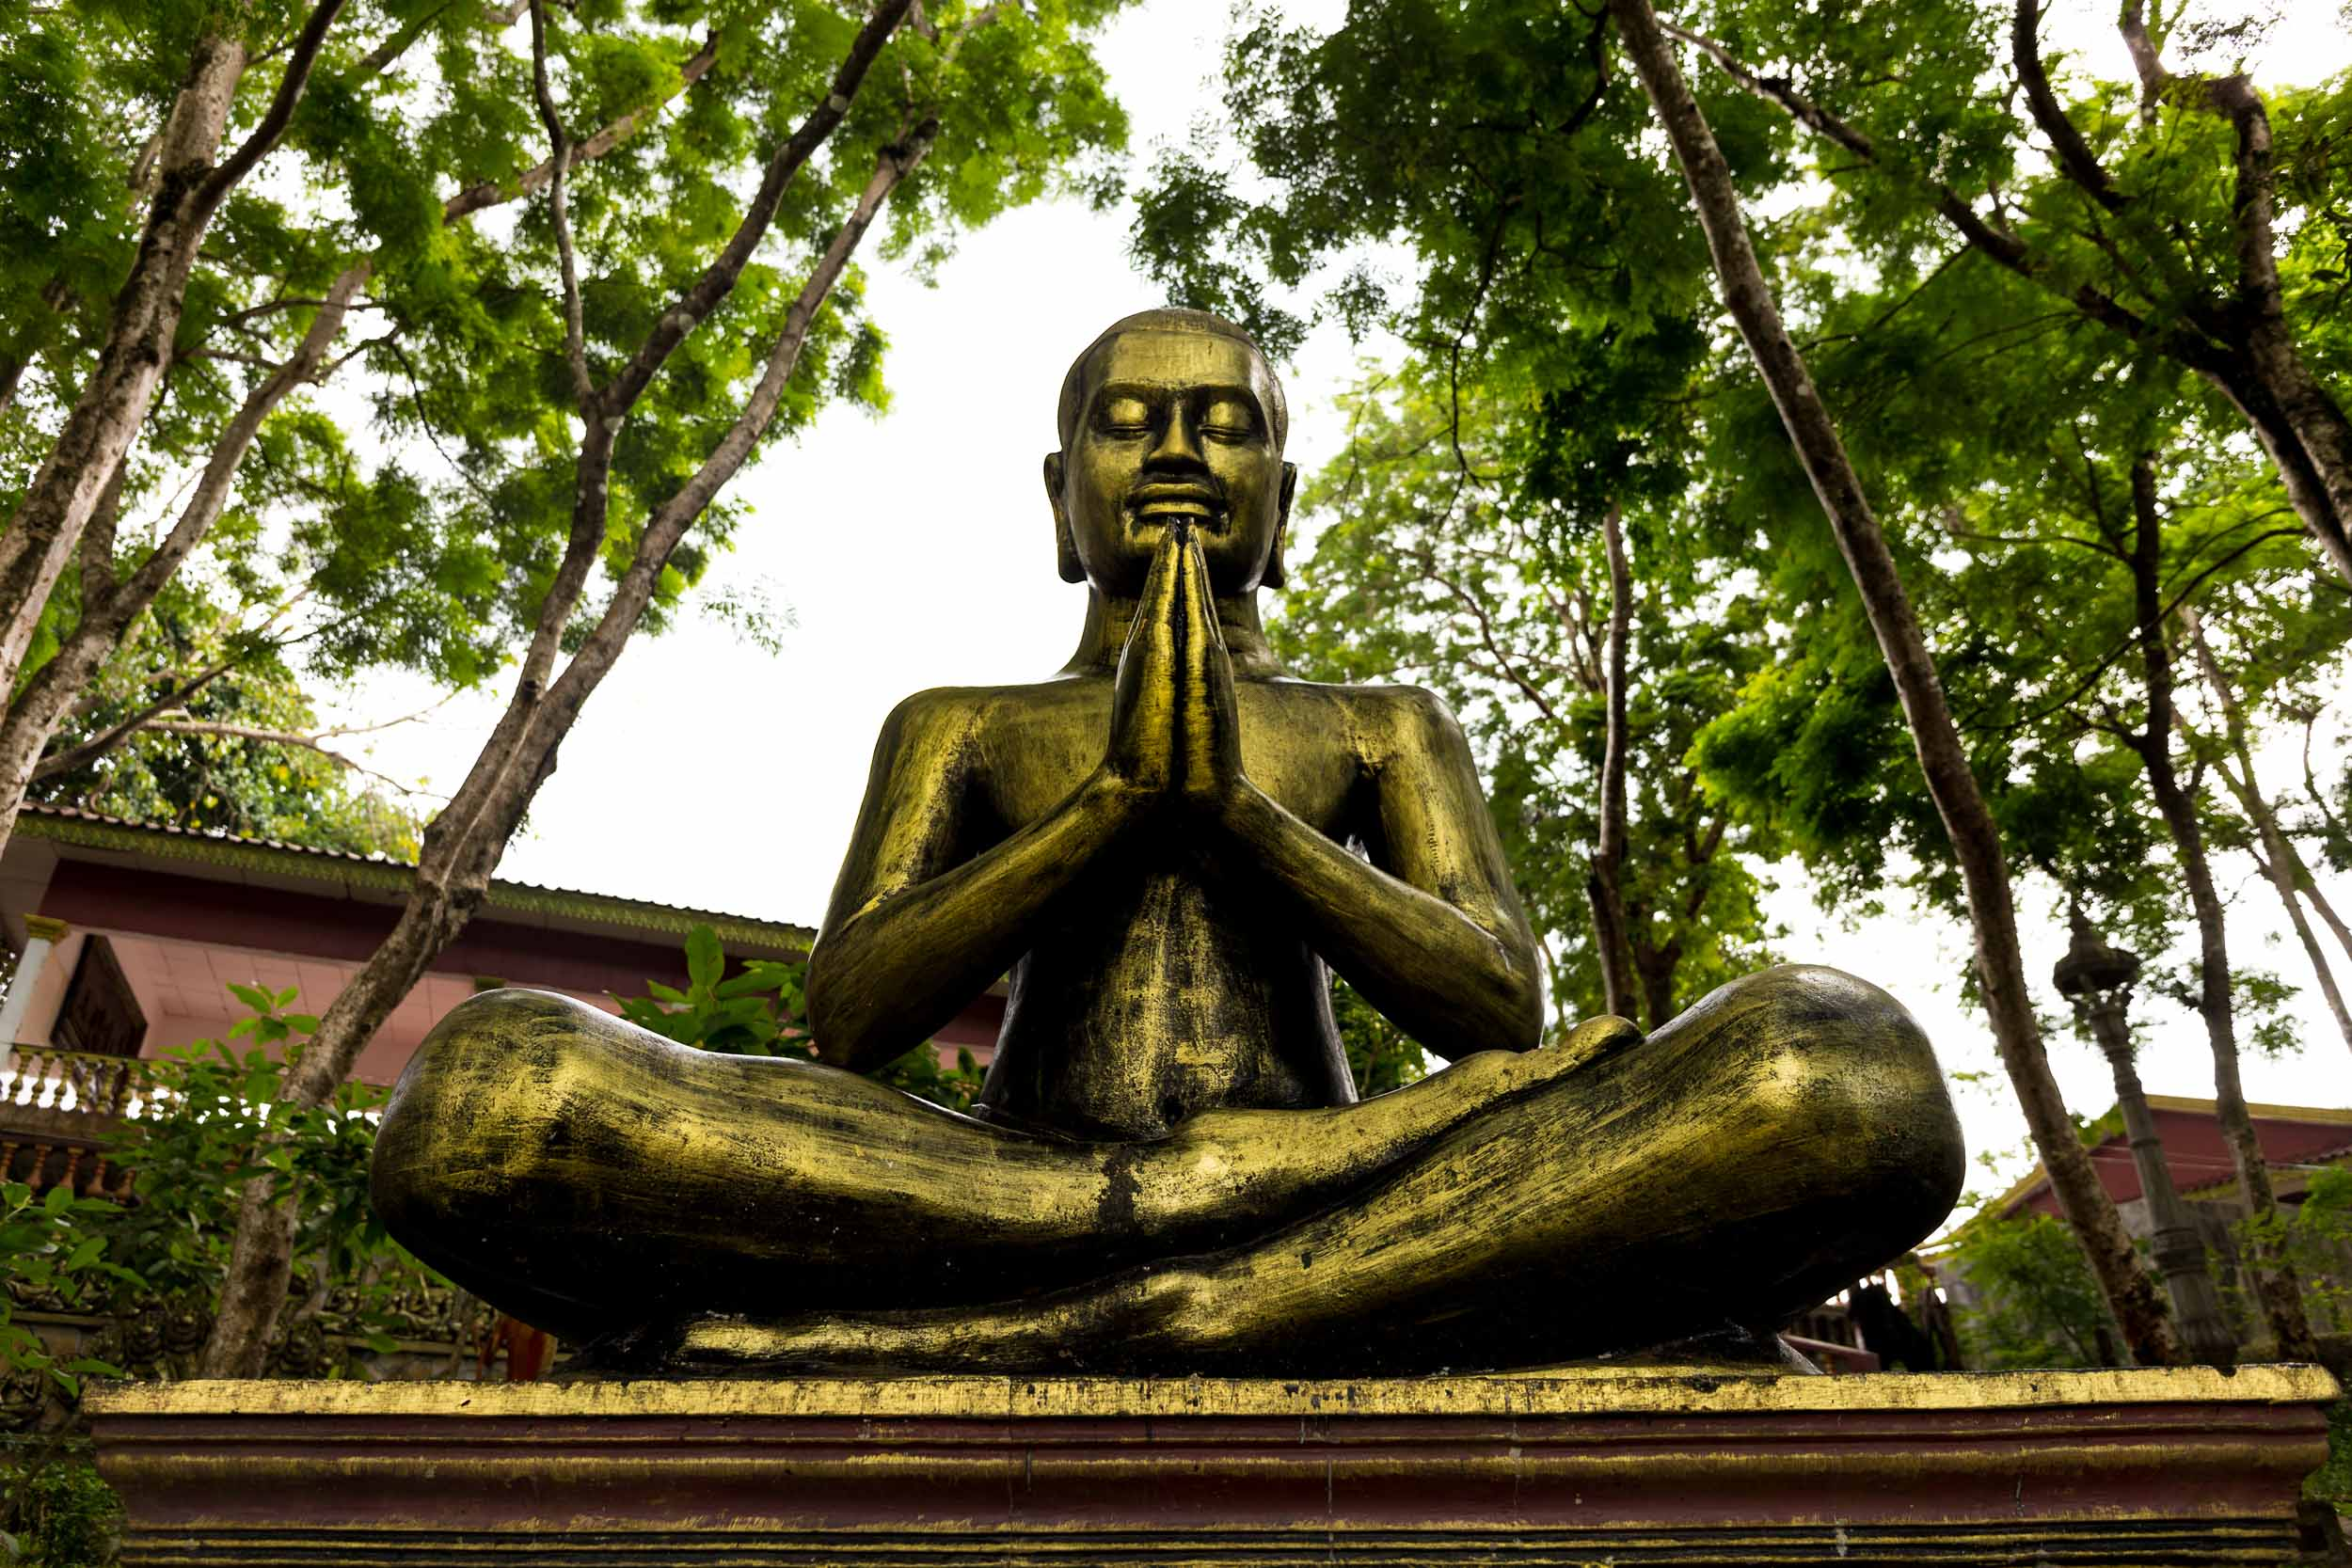 Praying Buddha - Sihanoukville, Cambodia - Rupert Turkington Travel Photography